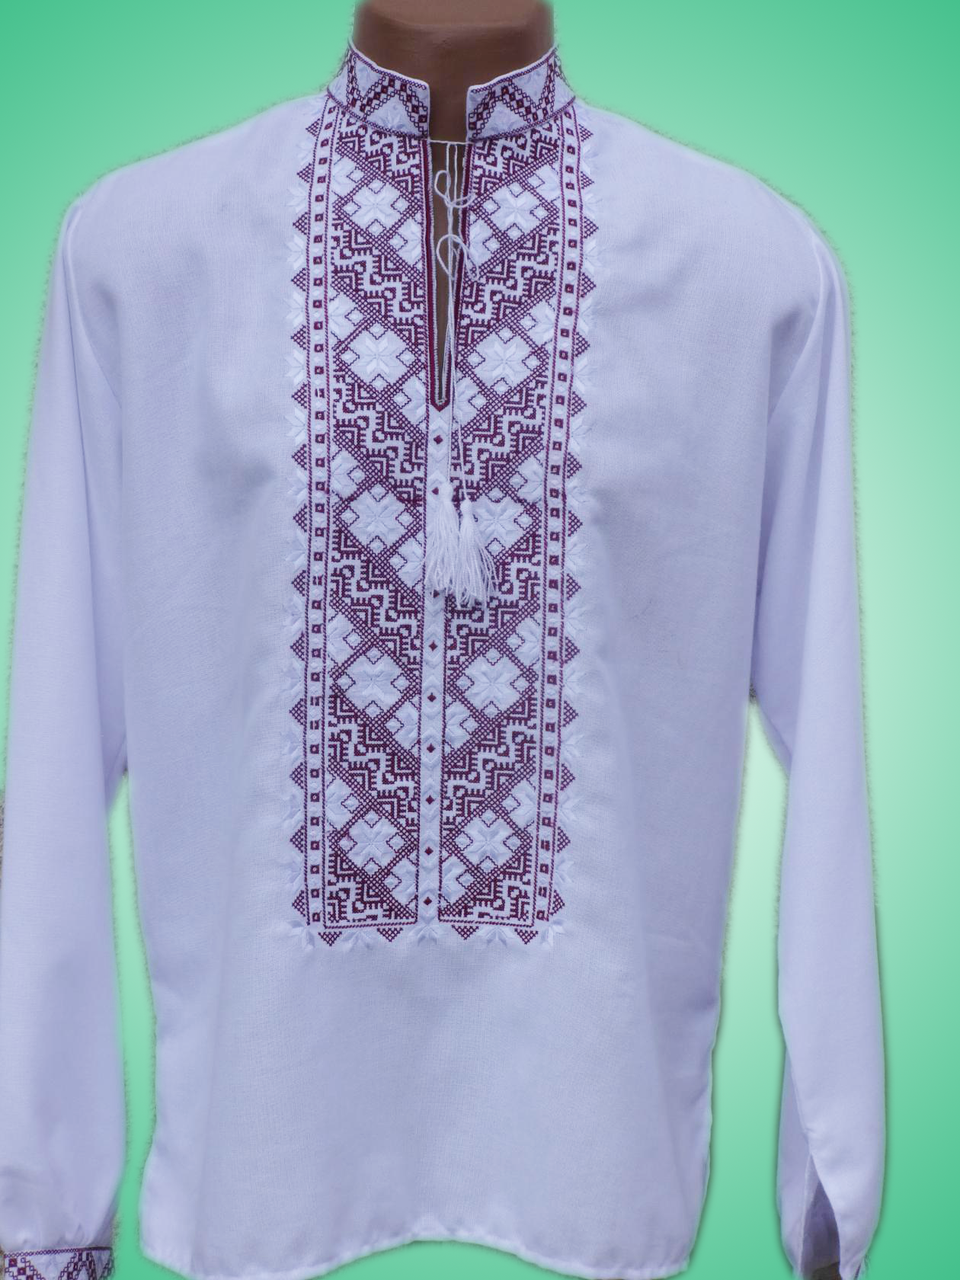 Чоловіча вишита сорочка з неповторним узором (Мужская вышитая рубашка с  неповторимым узором) SN- 0d5ae98ae6a0f